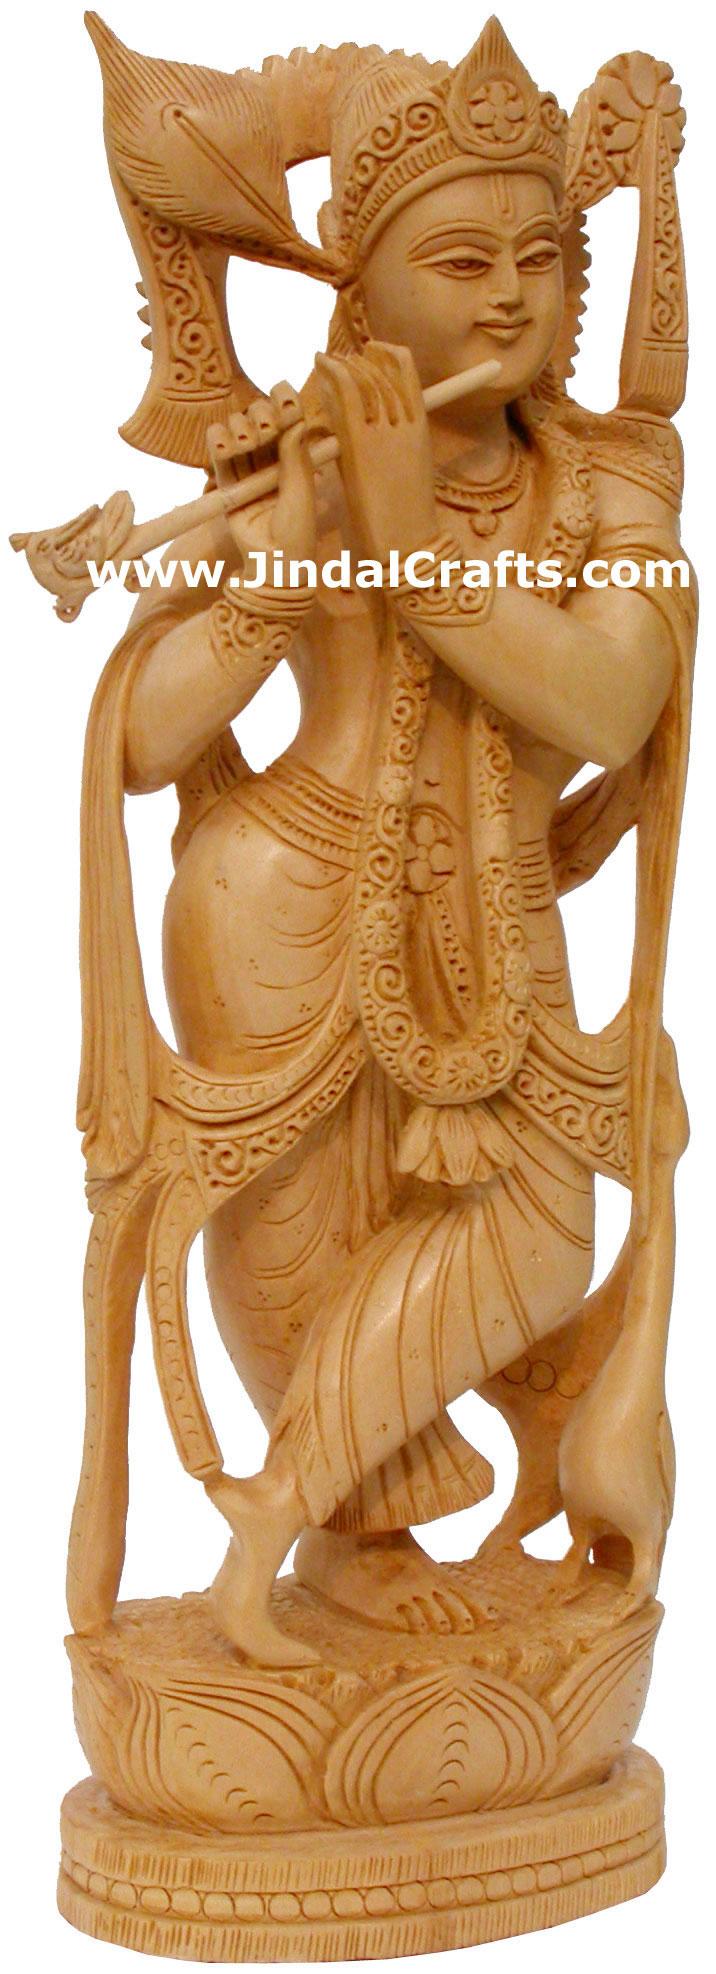 Hindu deities lord krishna india wood carving artifact